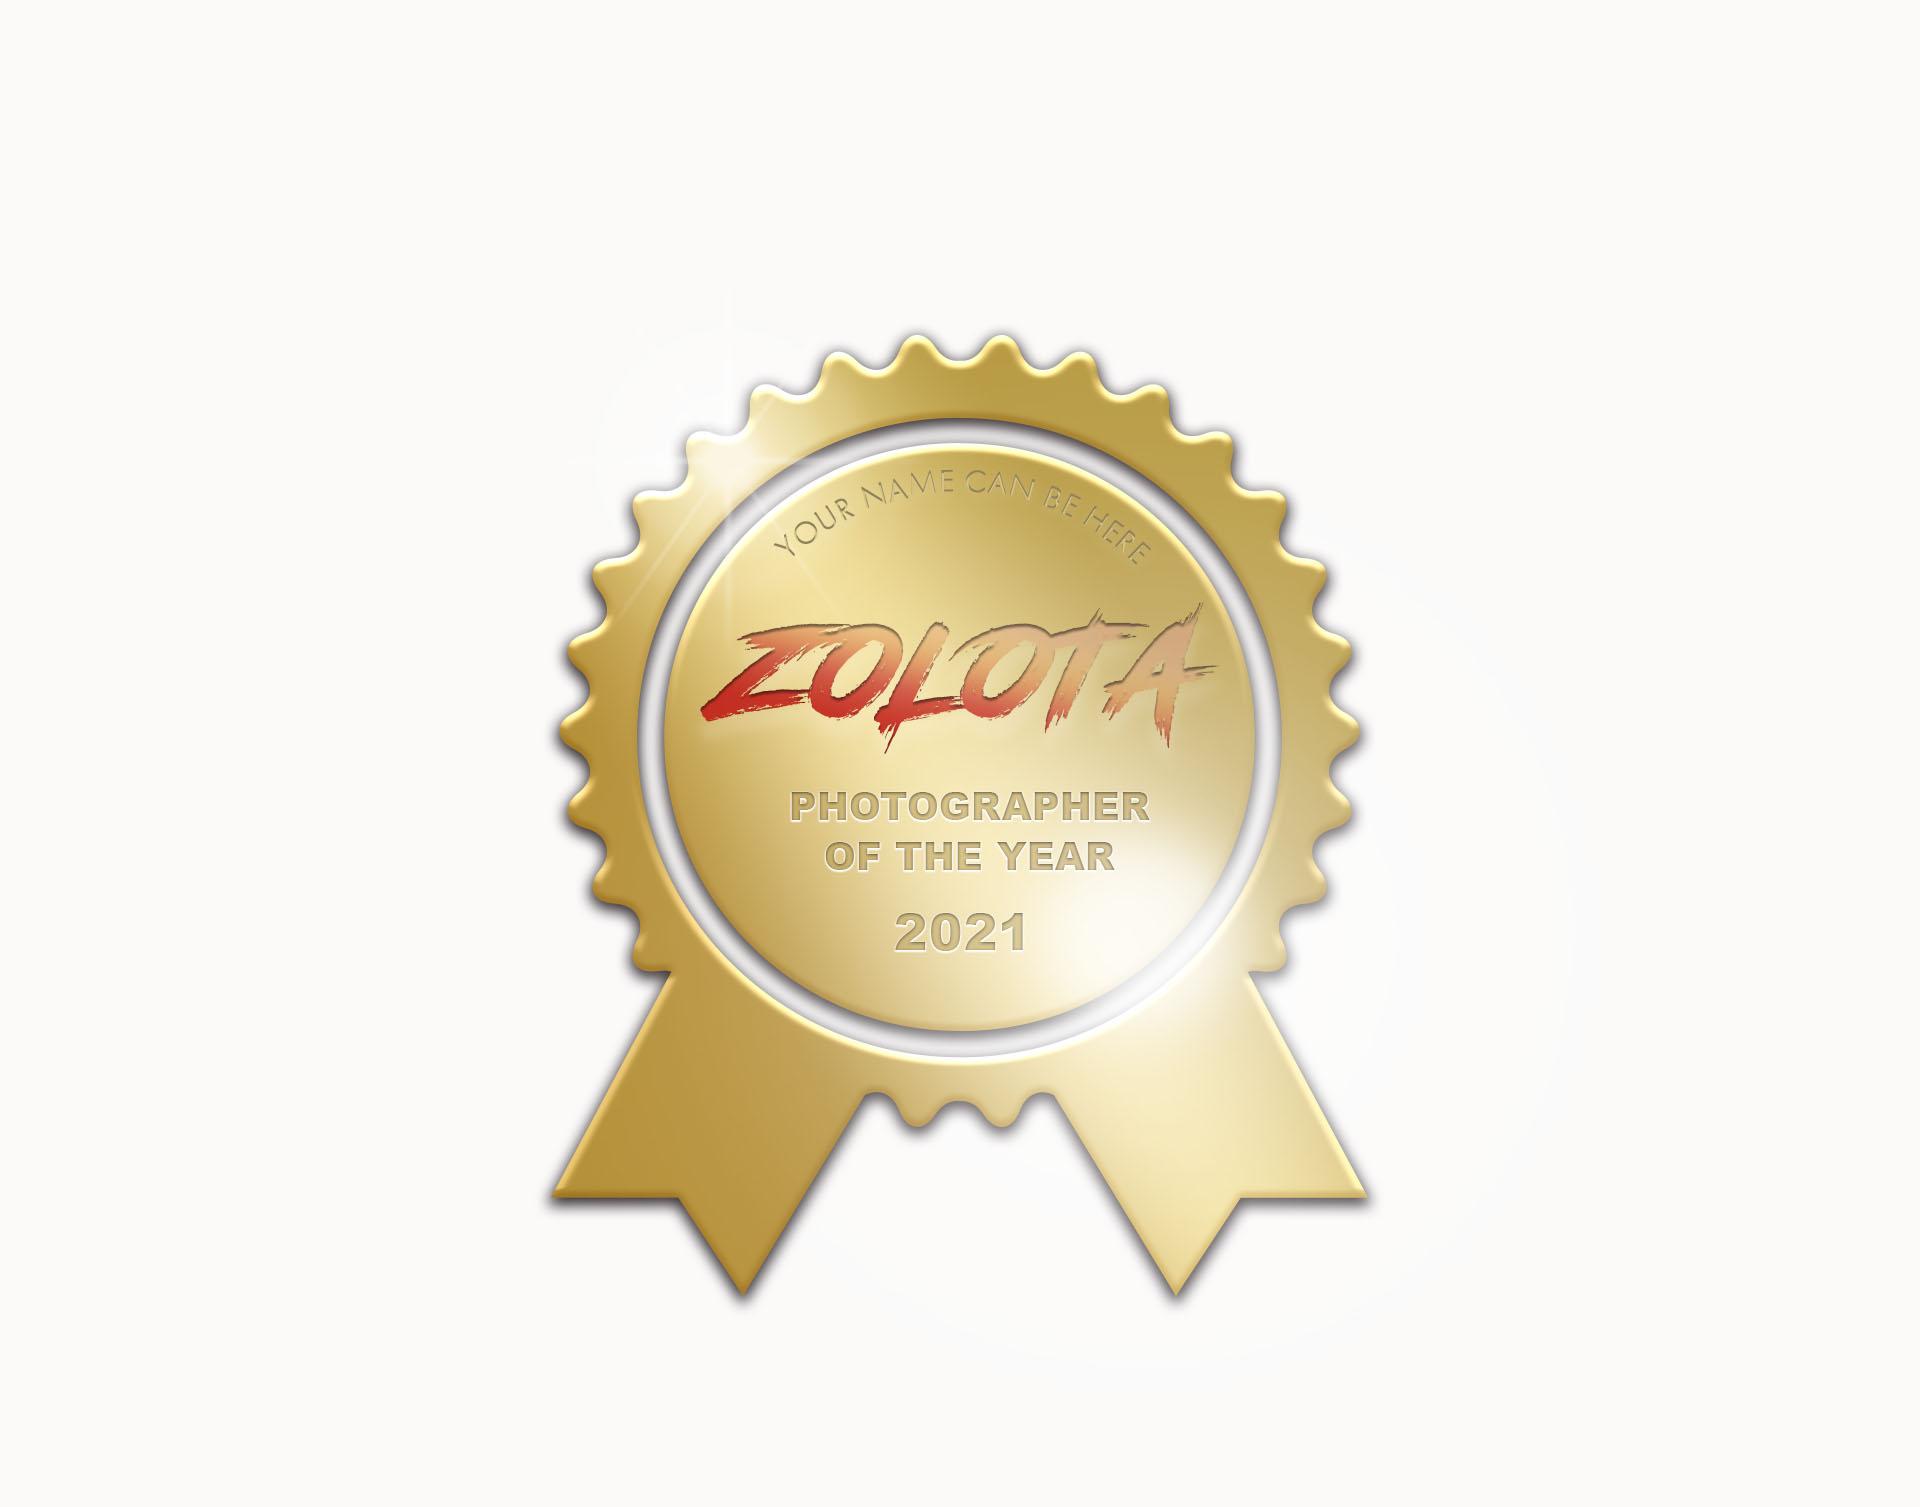 ZOLOTA PHOTOGRAPHER OF THE YEAR 2021 - logo